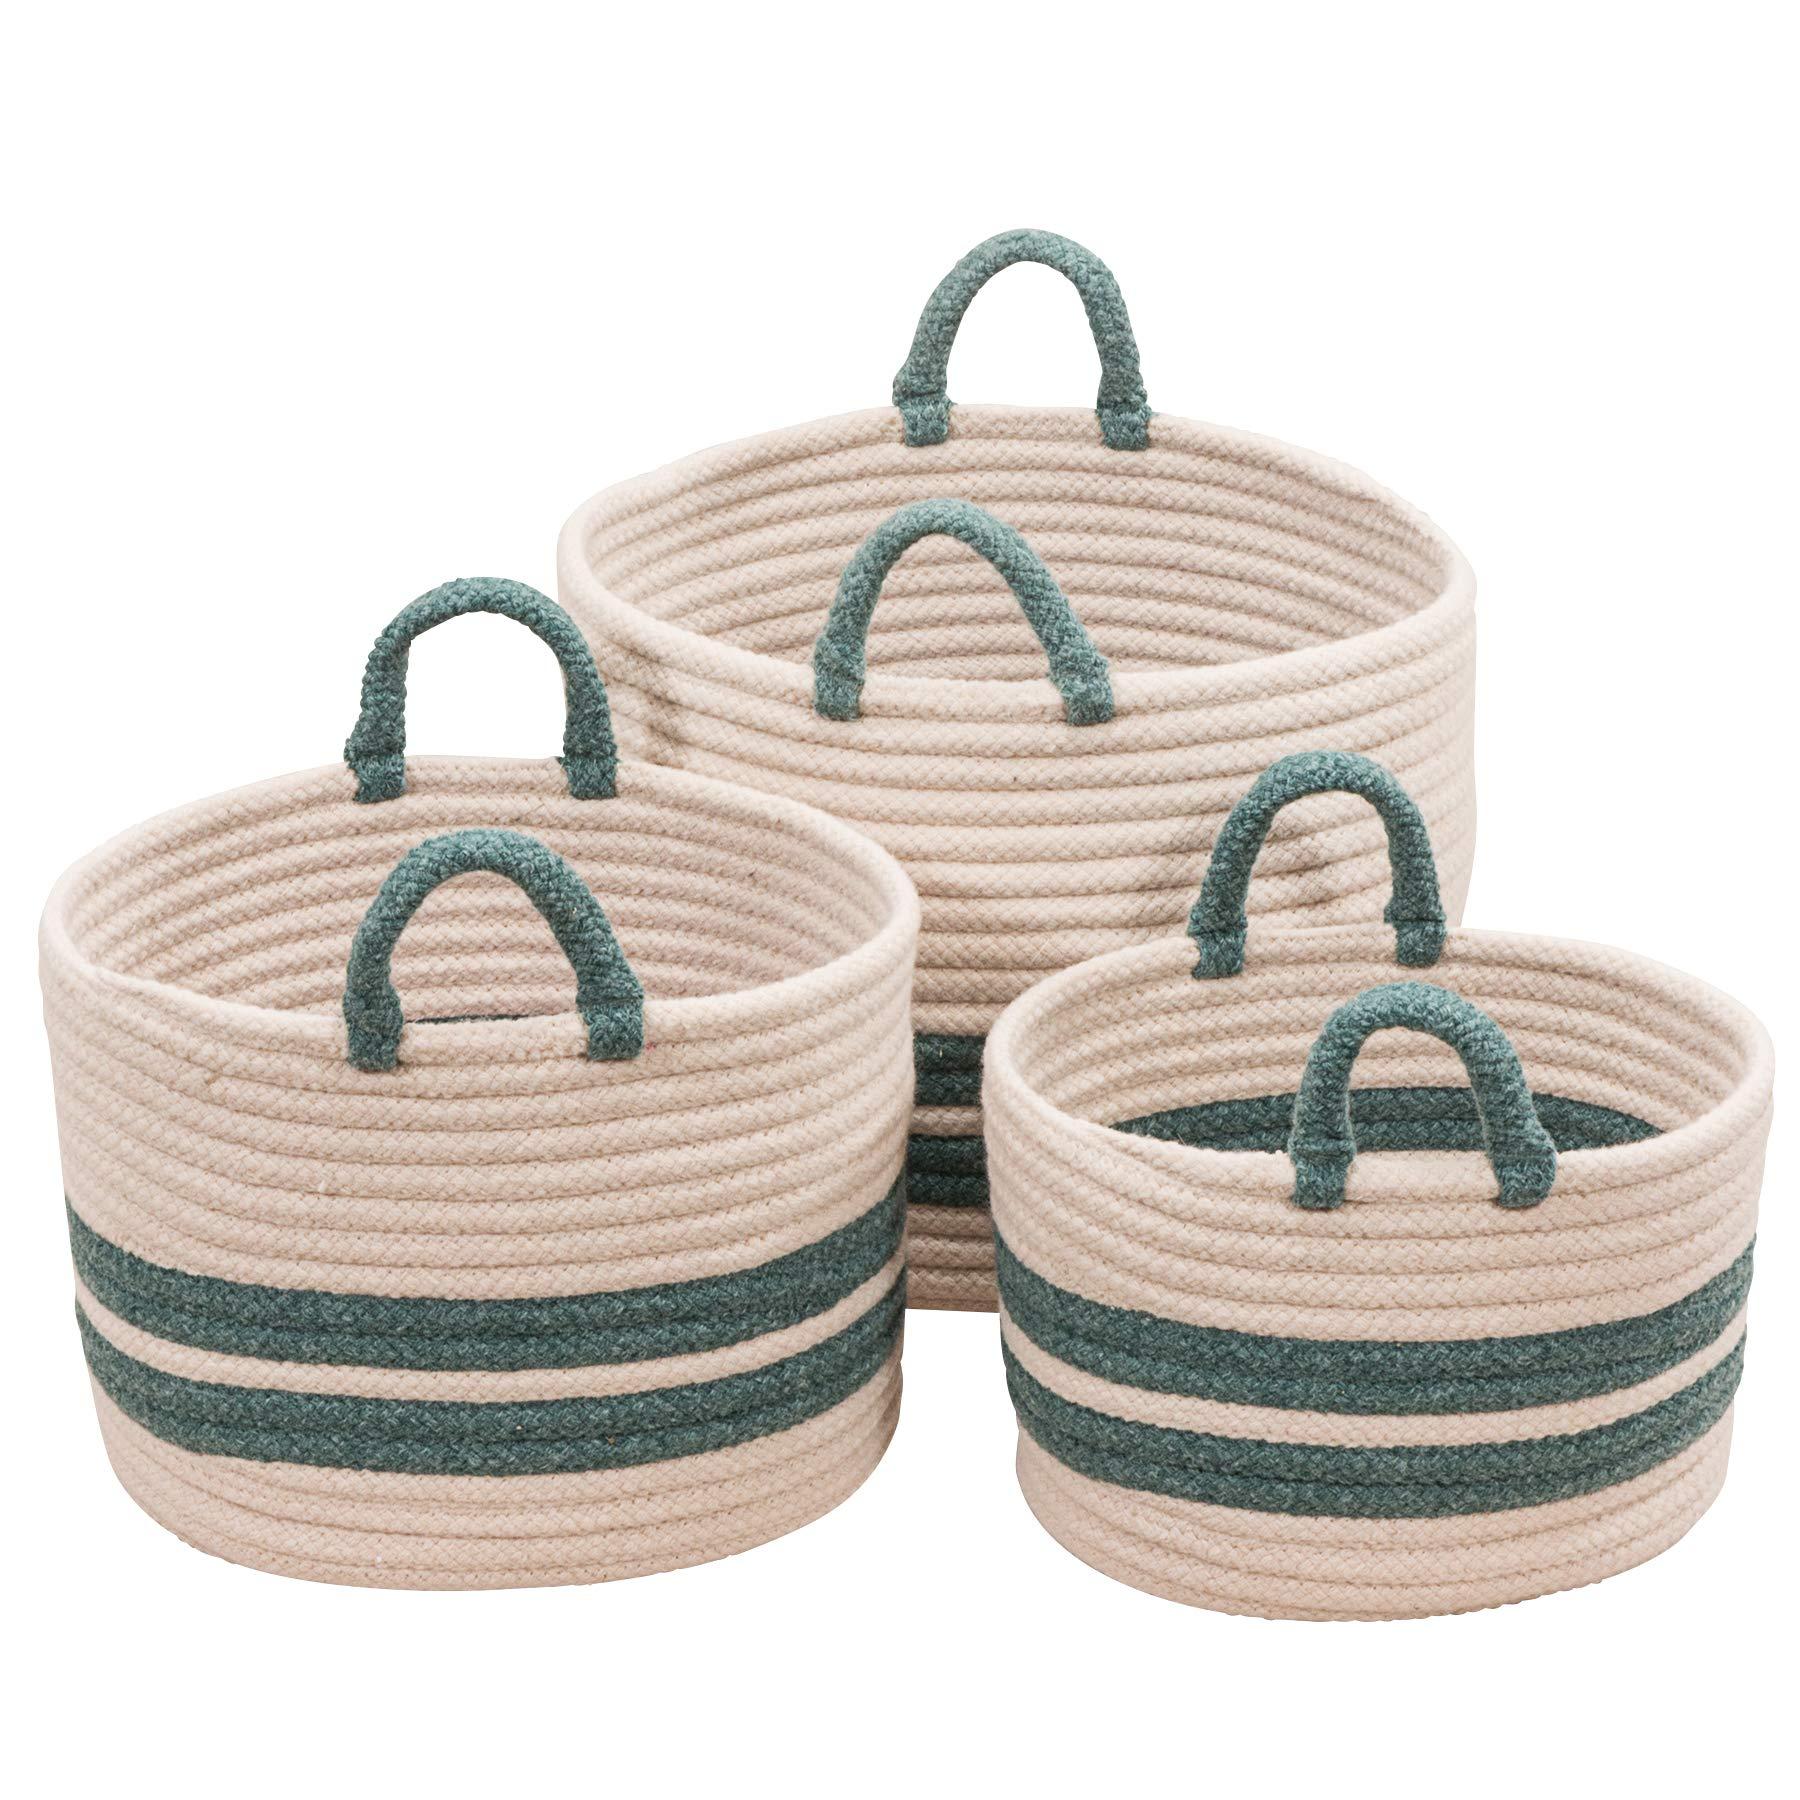 Scott Living CL16A016X012 Coastal Line Basket, 16''x12''x12'', Teal